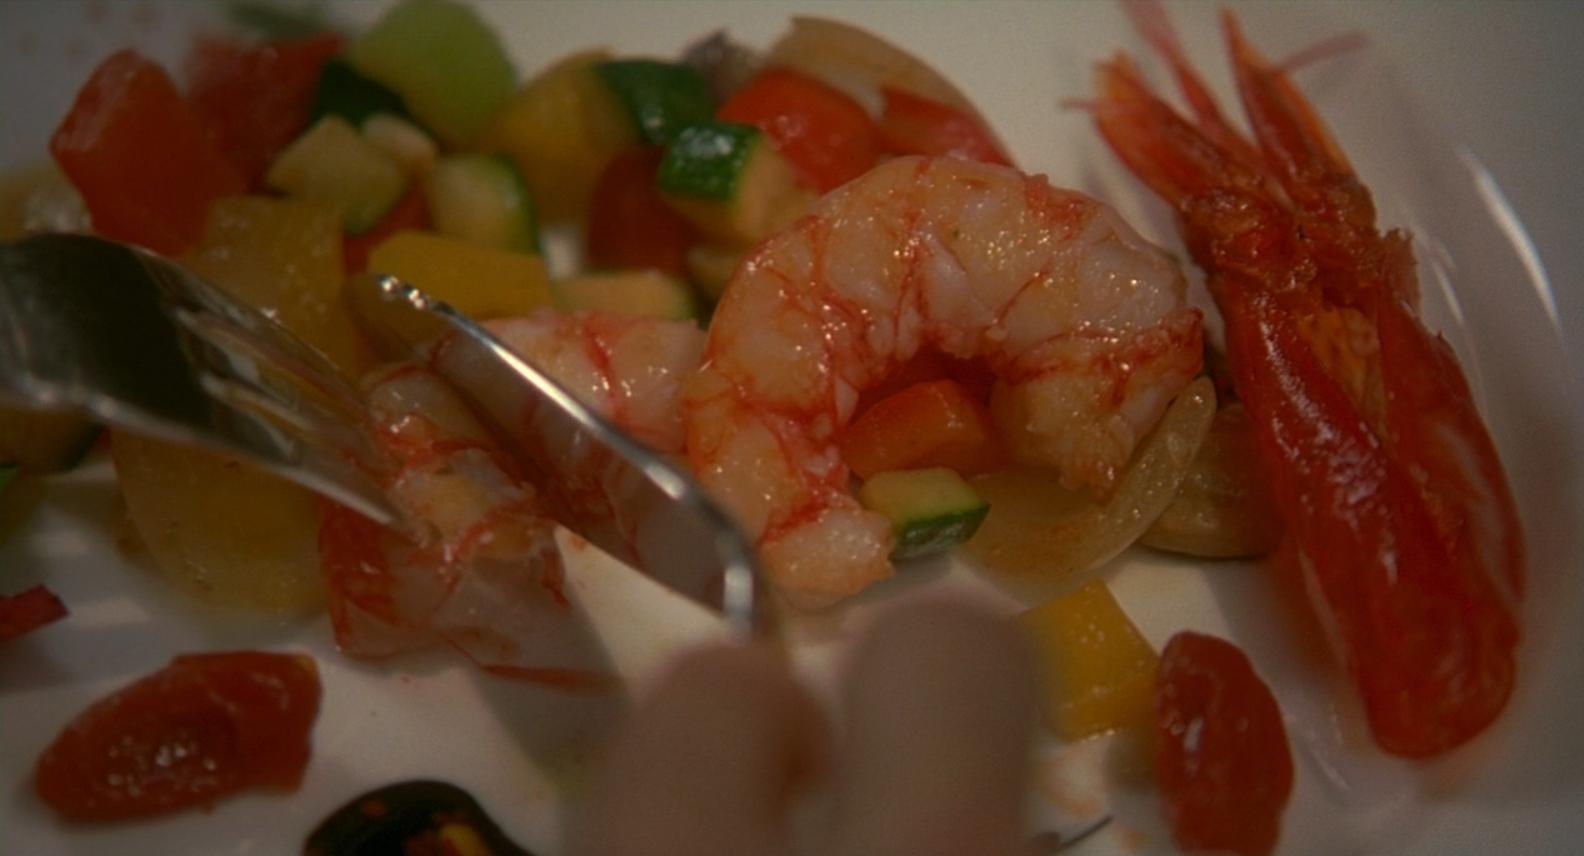 http://2.bp.blogspot.com/-s6oiEEJpgig/UC08PAkMW4I/AAAAAAAABlY/h0NR1Xsfu7M/s1600/I+Am+Love_Food_2.jpg